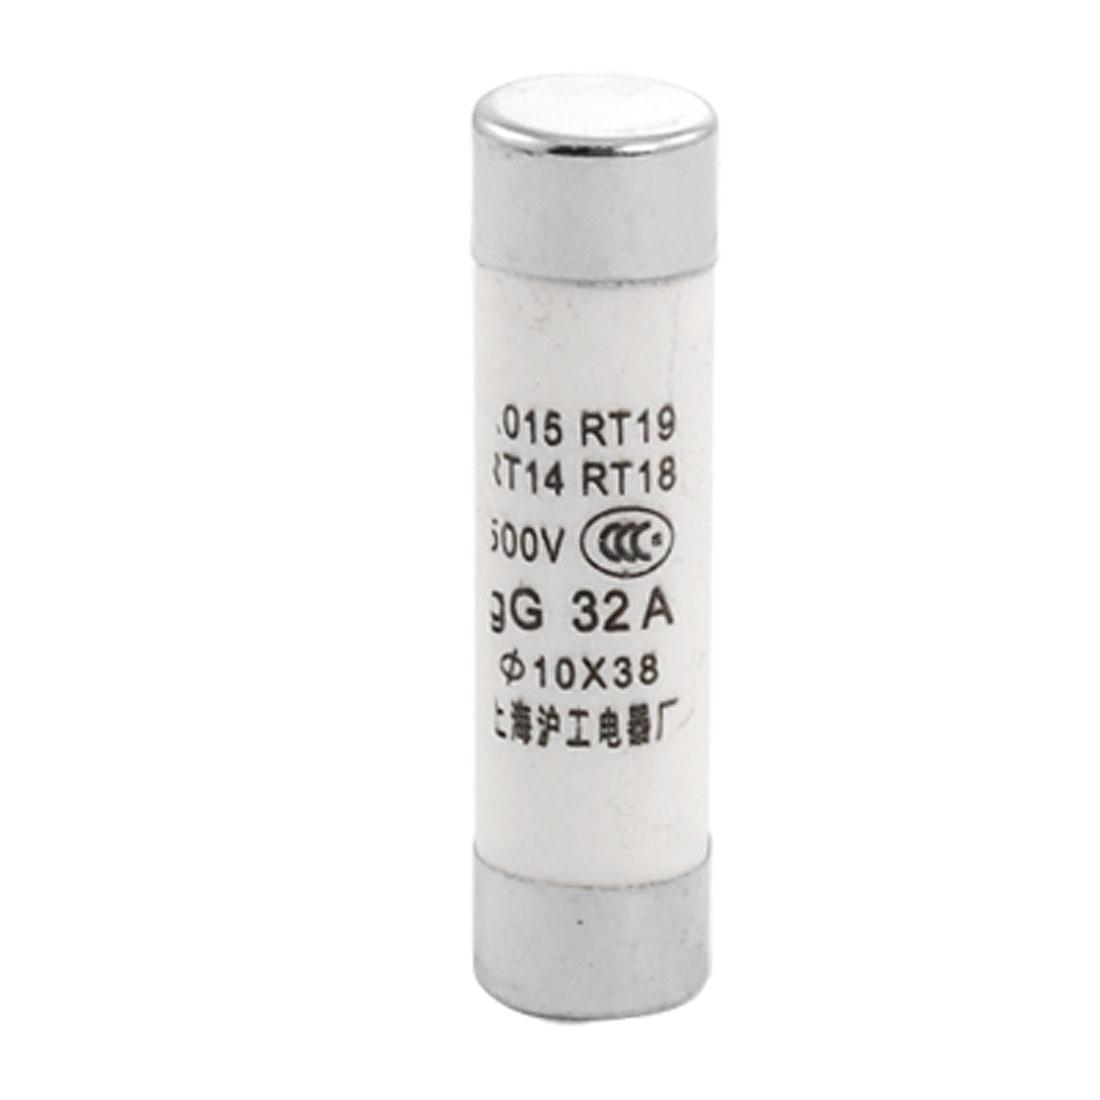 20 Pcs 10 x 38mm Cylindrical Fuse Links 500V 32A